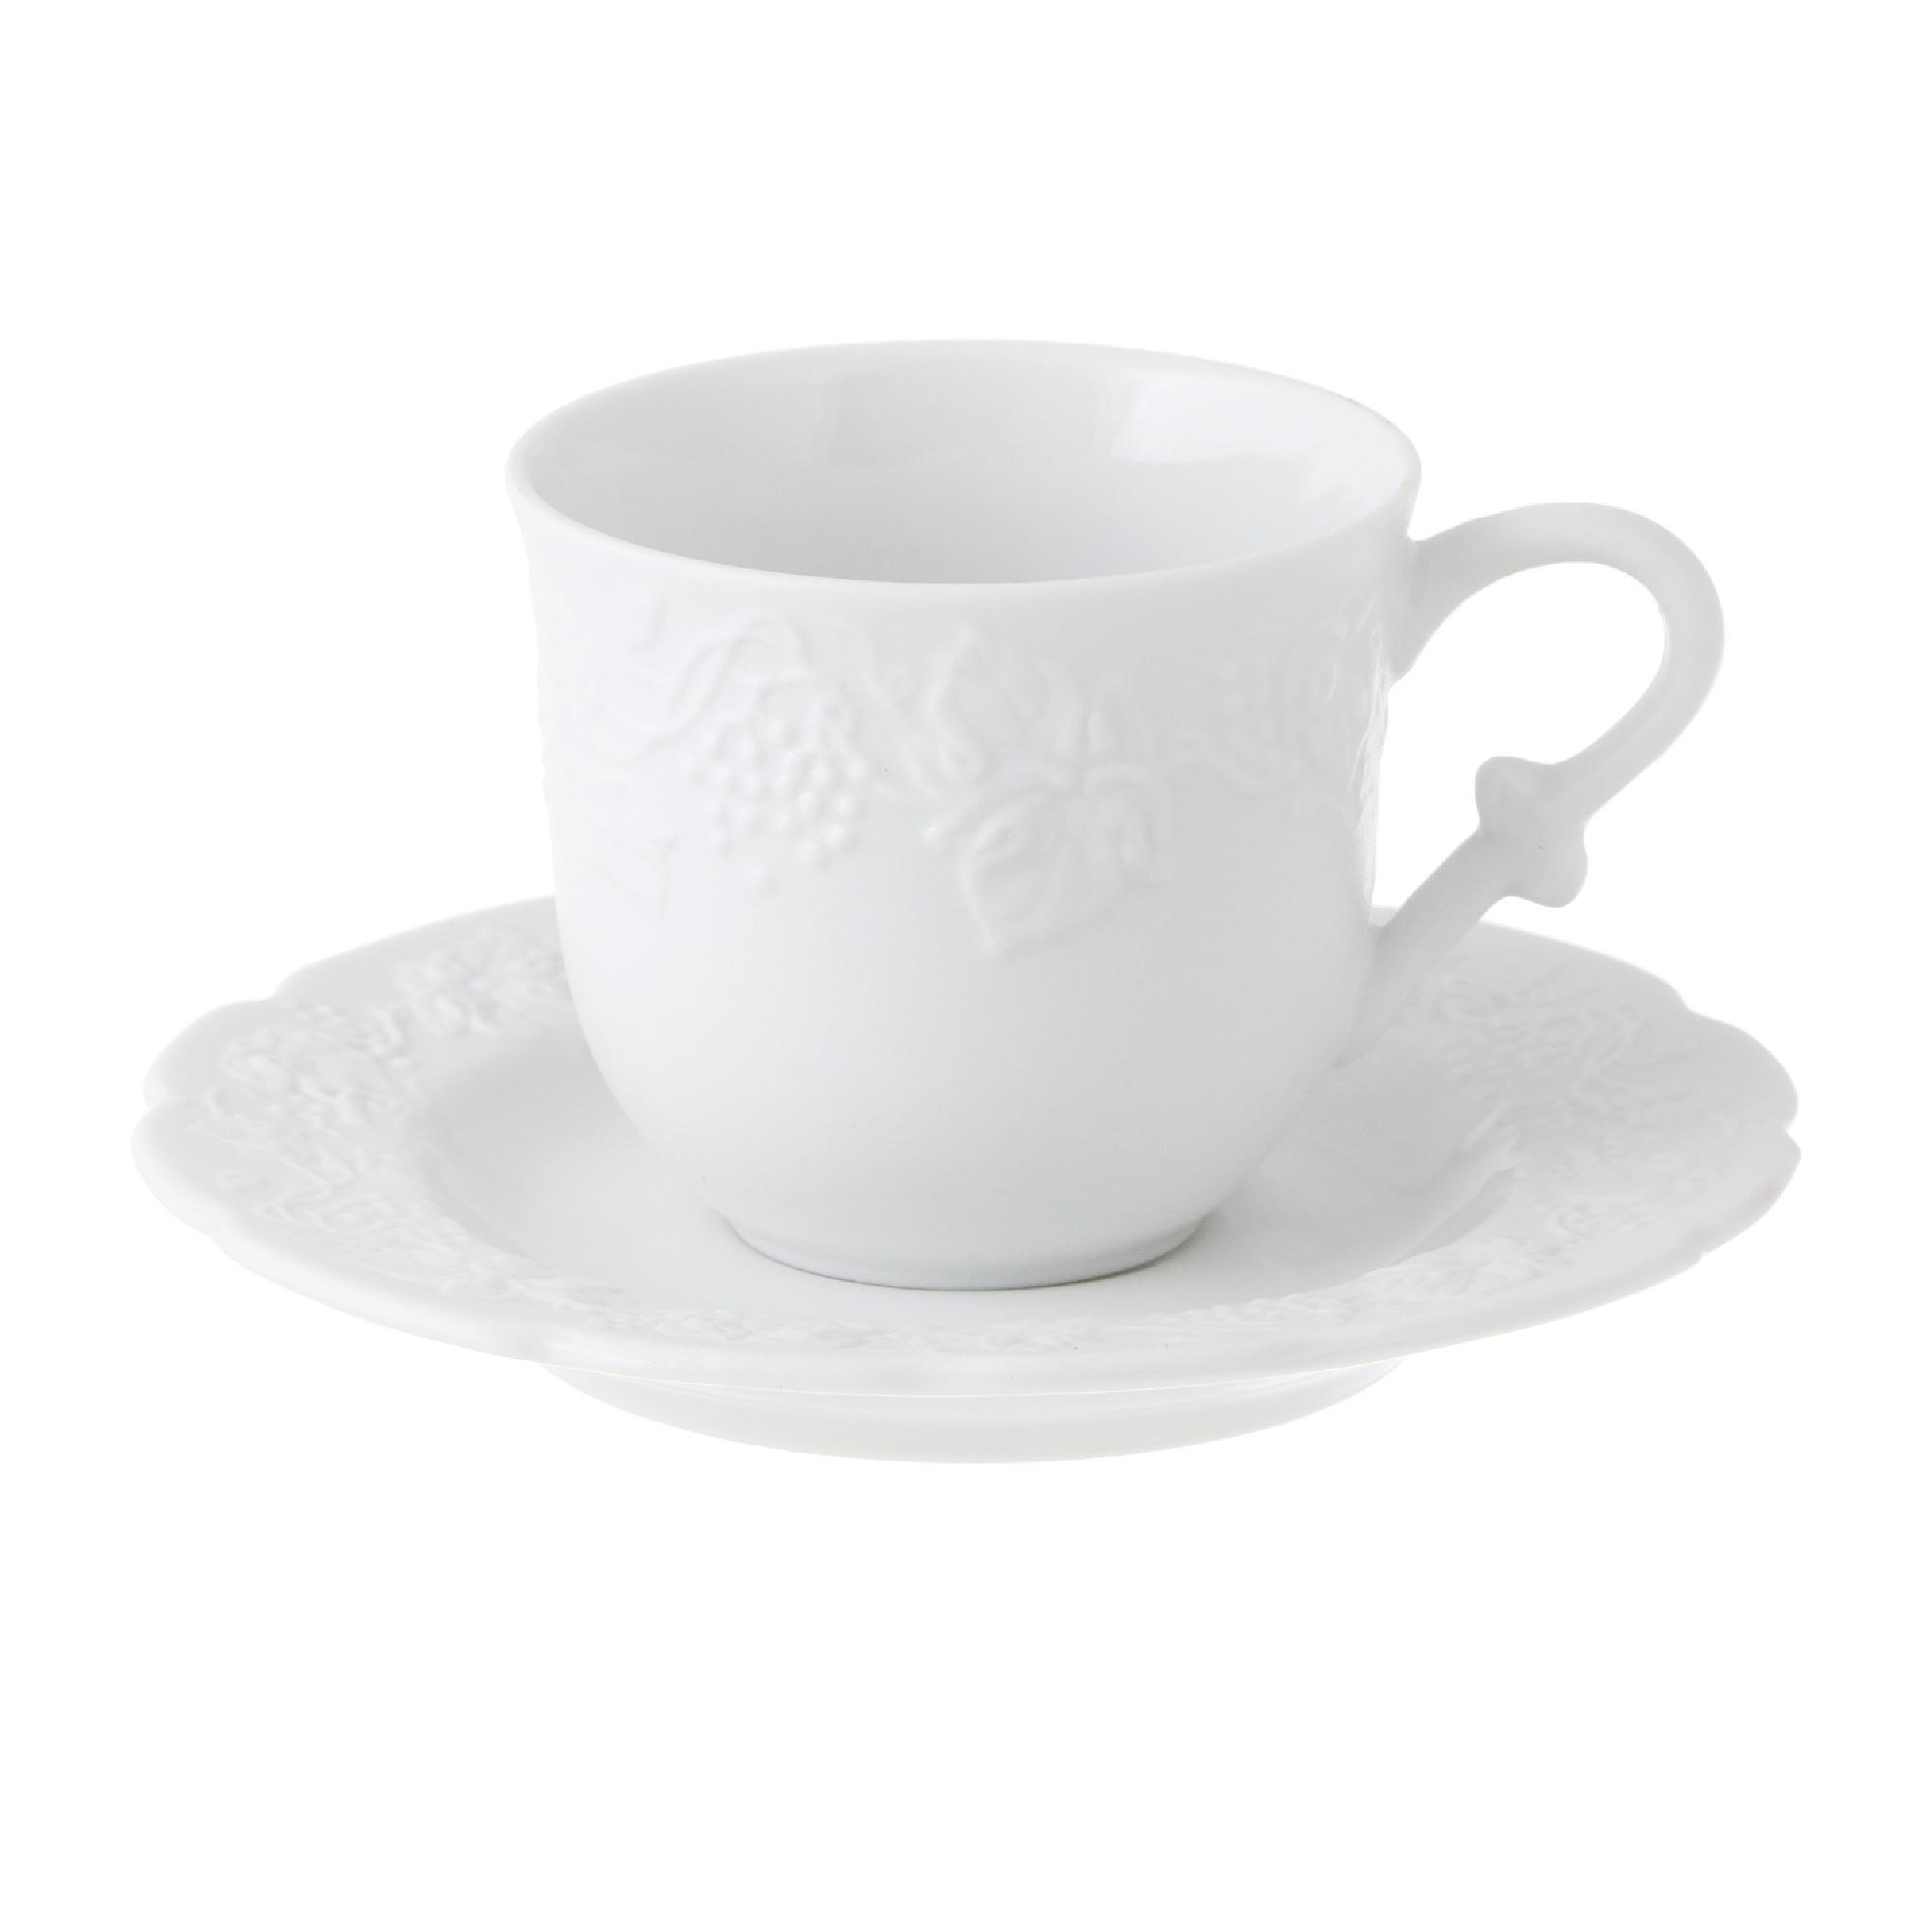 Пара кофейная Yves de la Rosiere Blanc 100 мл